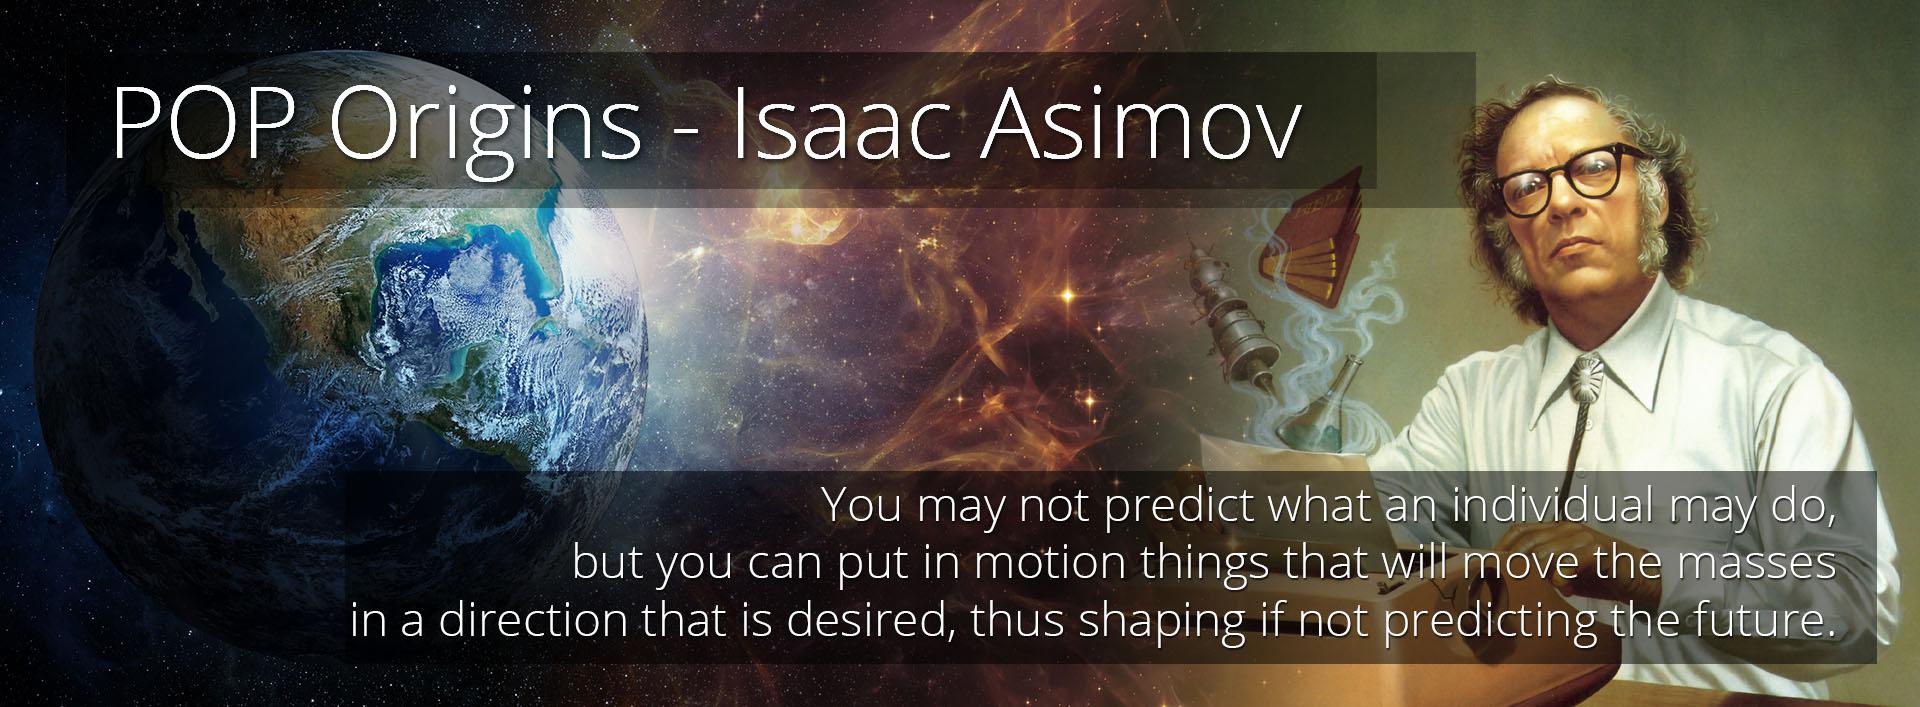 POP-Origins - Isaac-Asimov